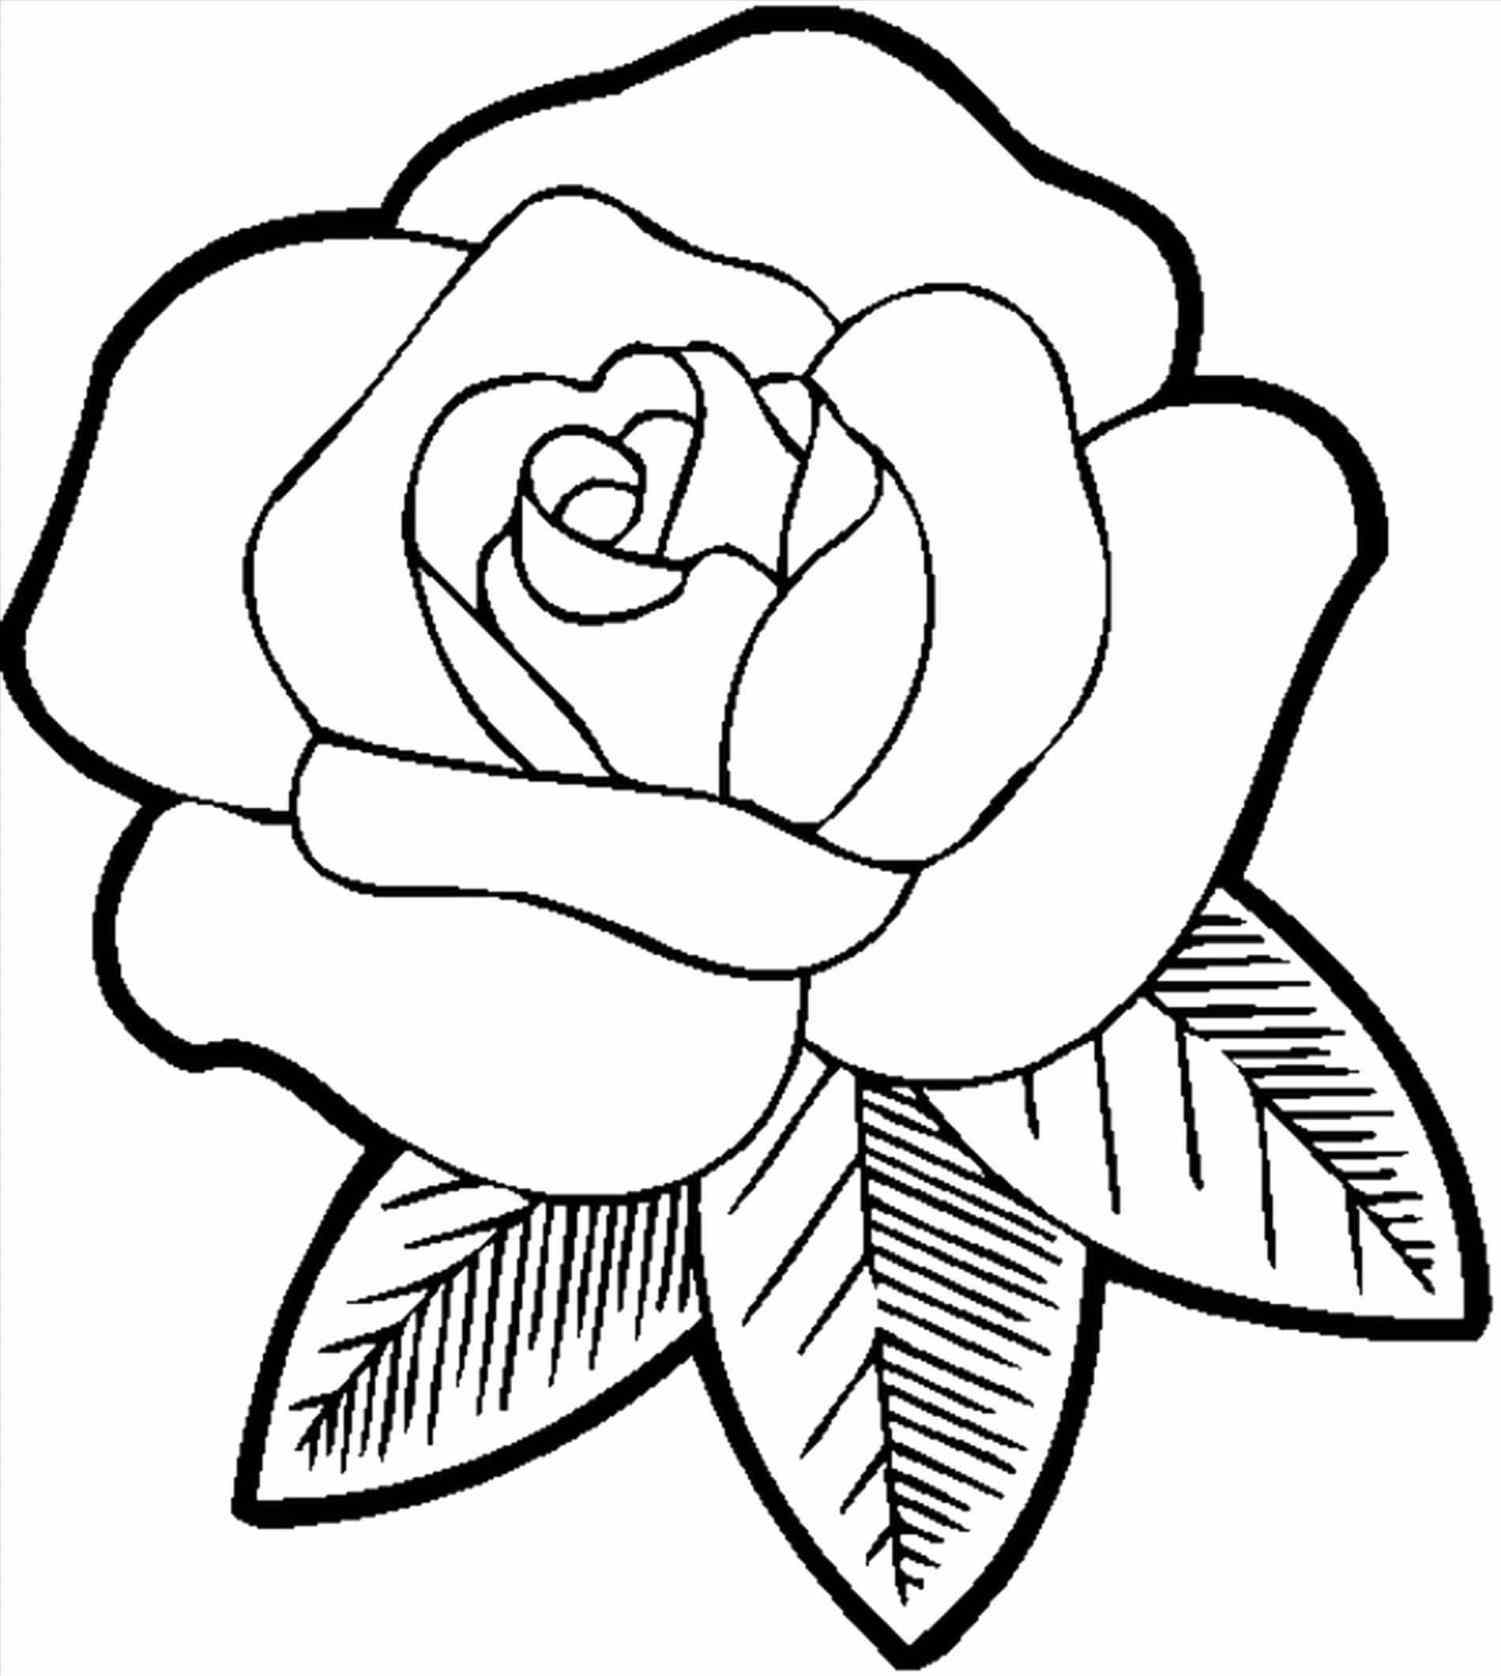 1501x1676 Flower Outline Lotus Japanese Flowers Drawings Easy Flower Outline